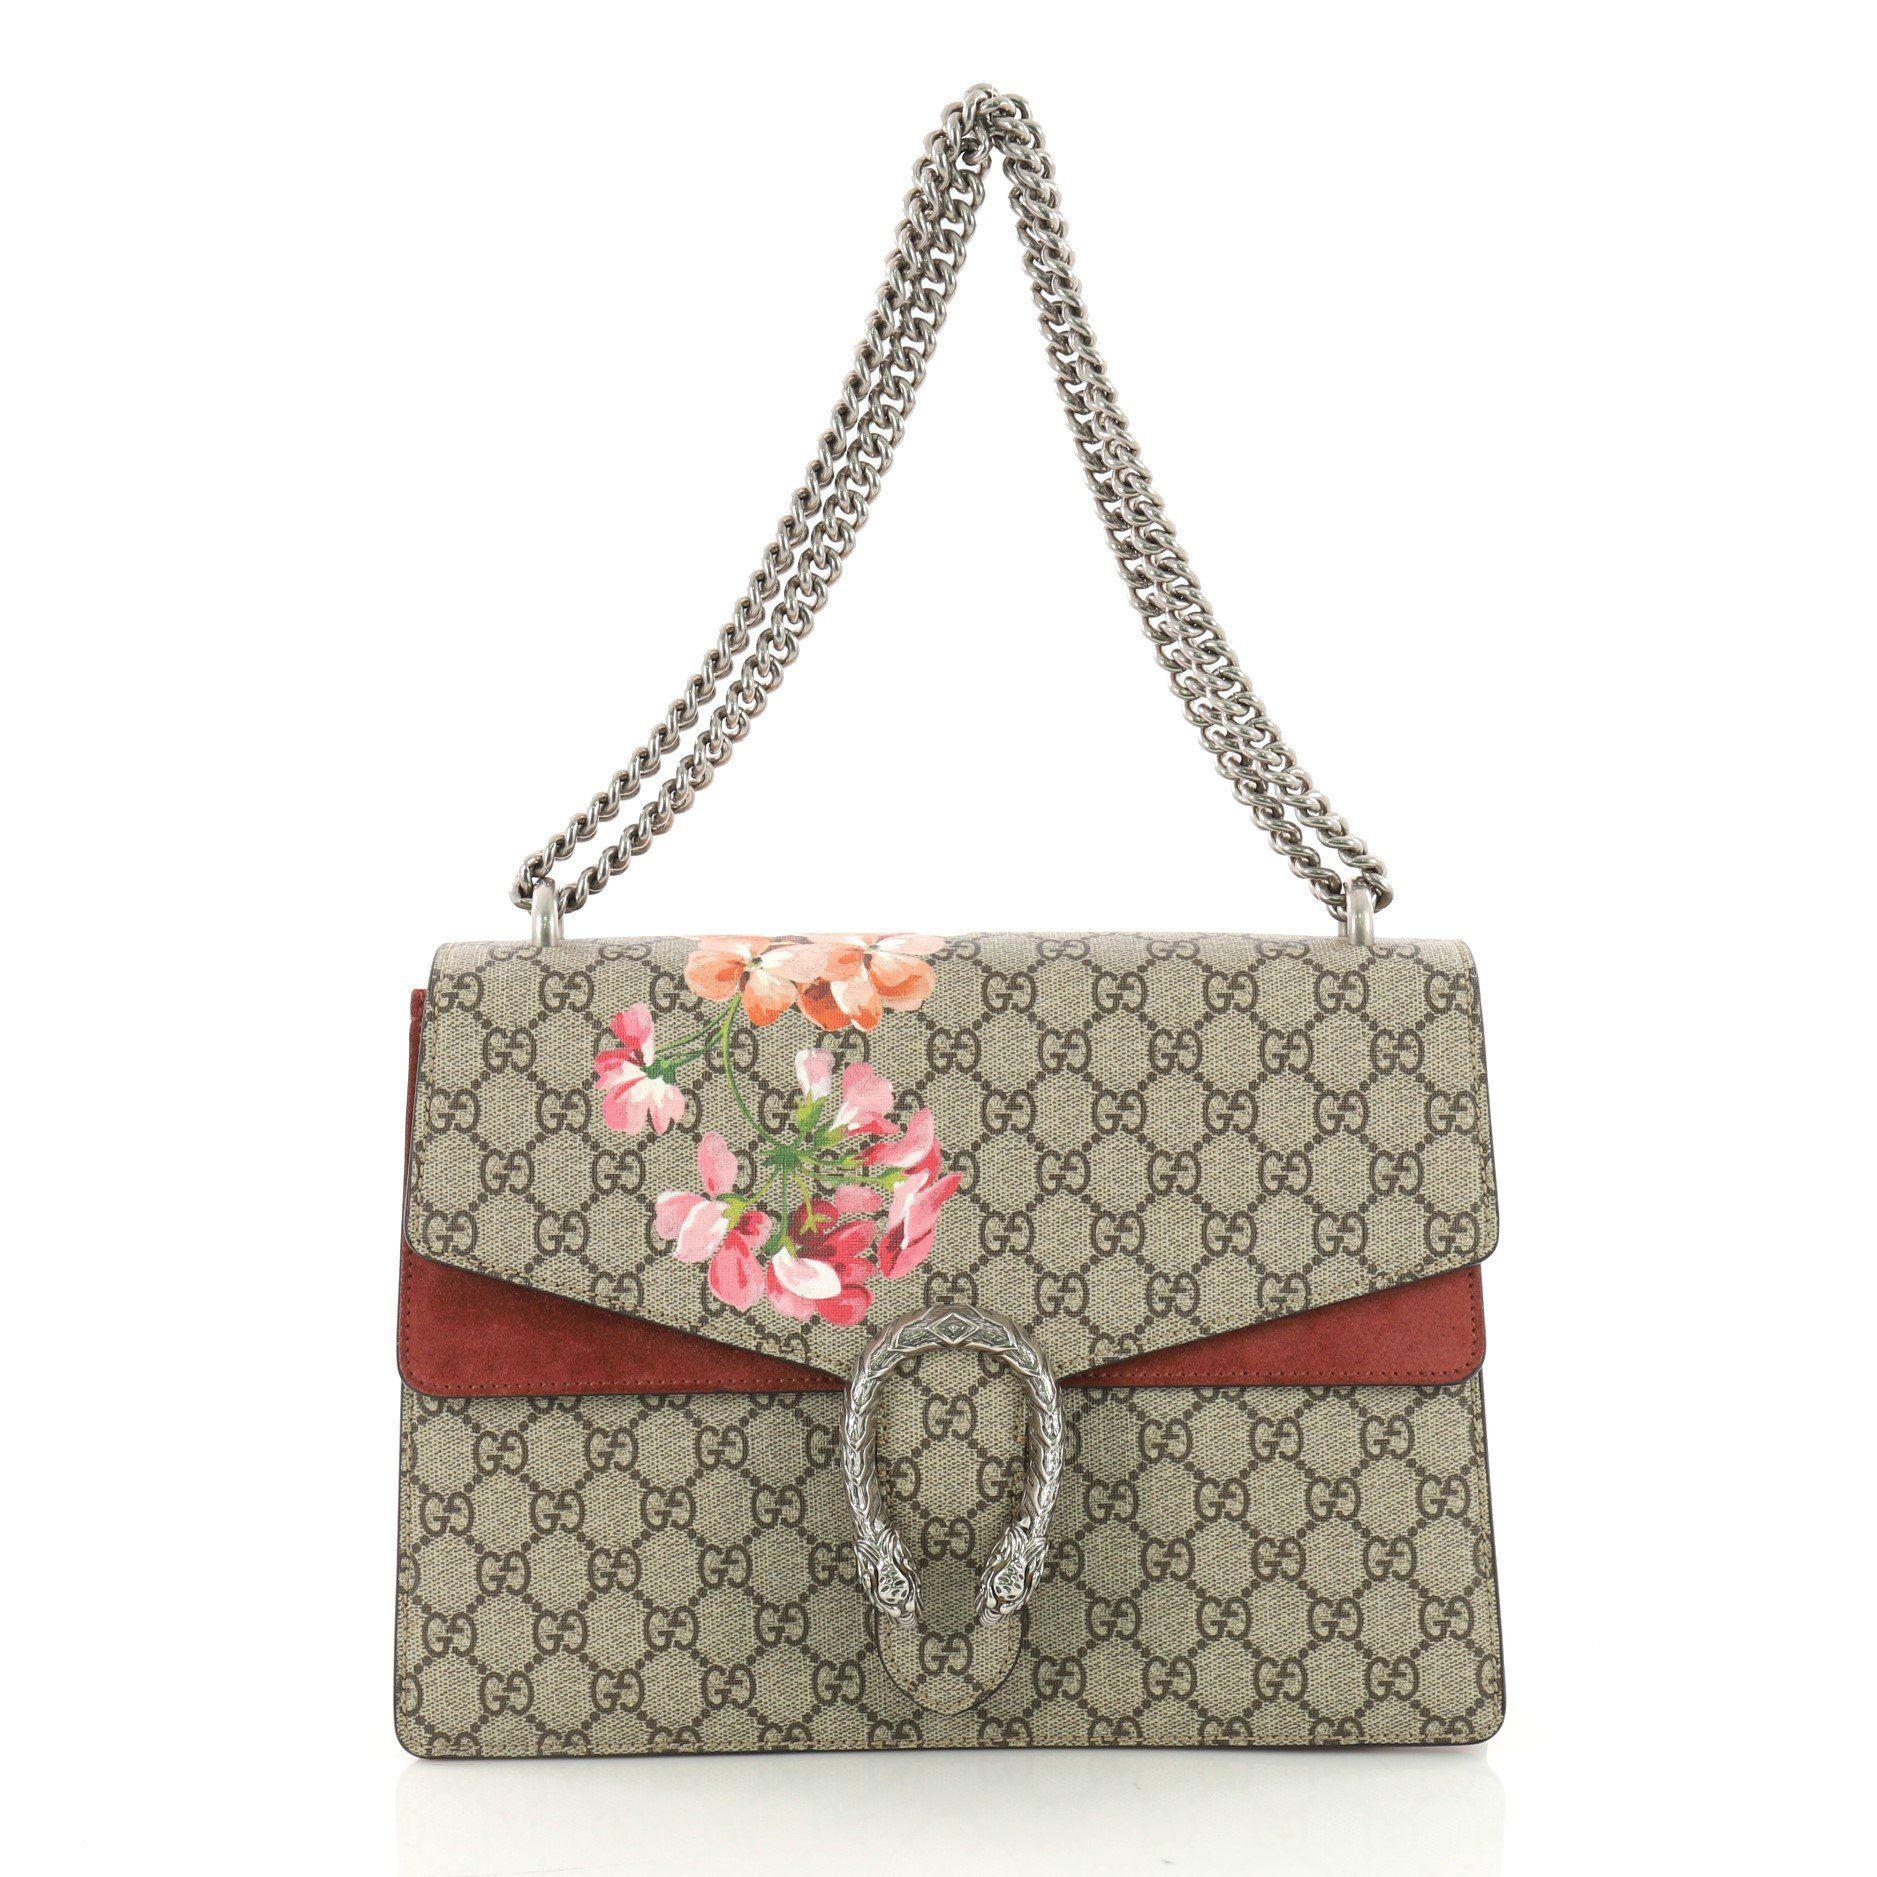 f56cb055aef1ac Lyst - Gucci Pre Owned Dionysus Handbag Blooms Print GG Coated ...